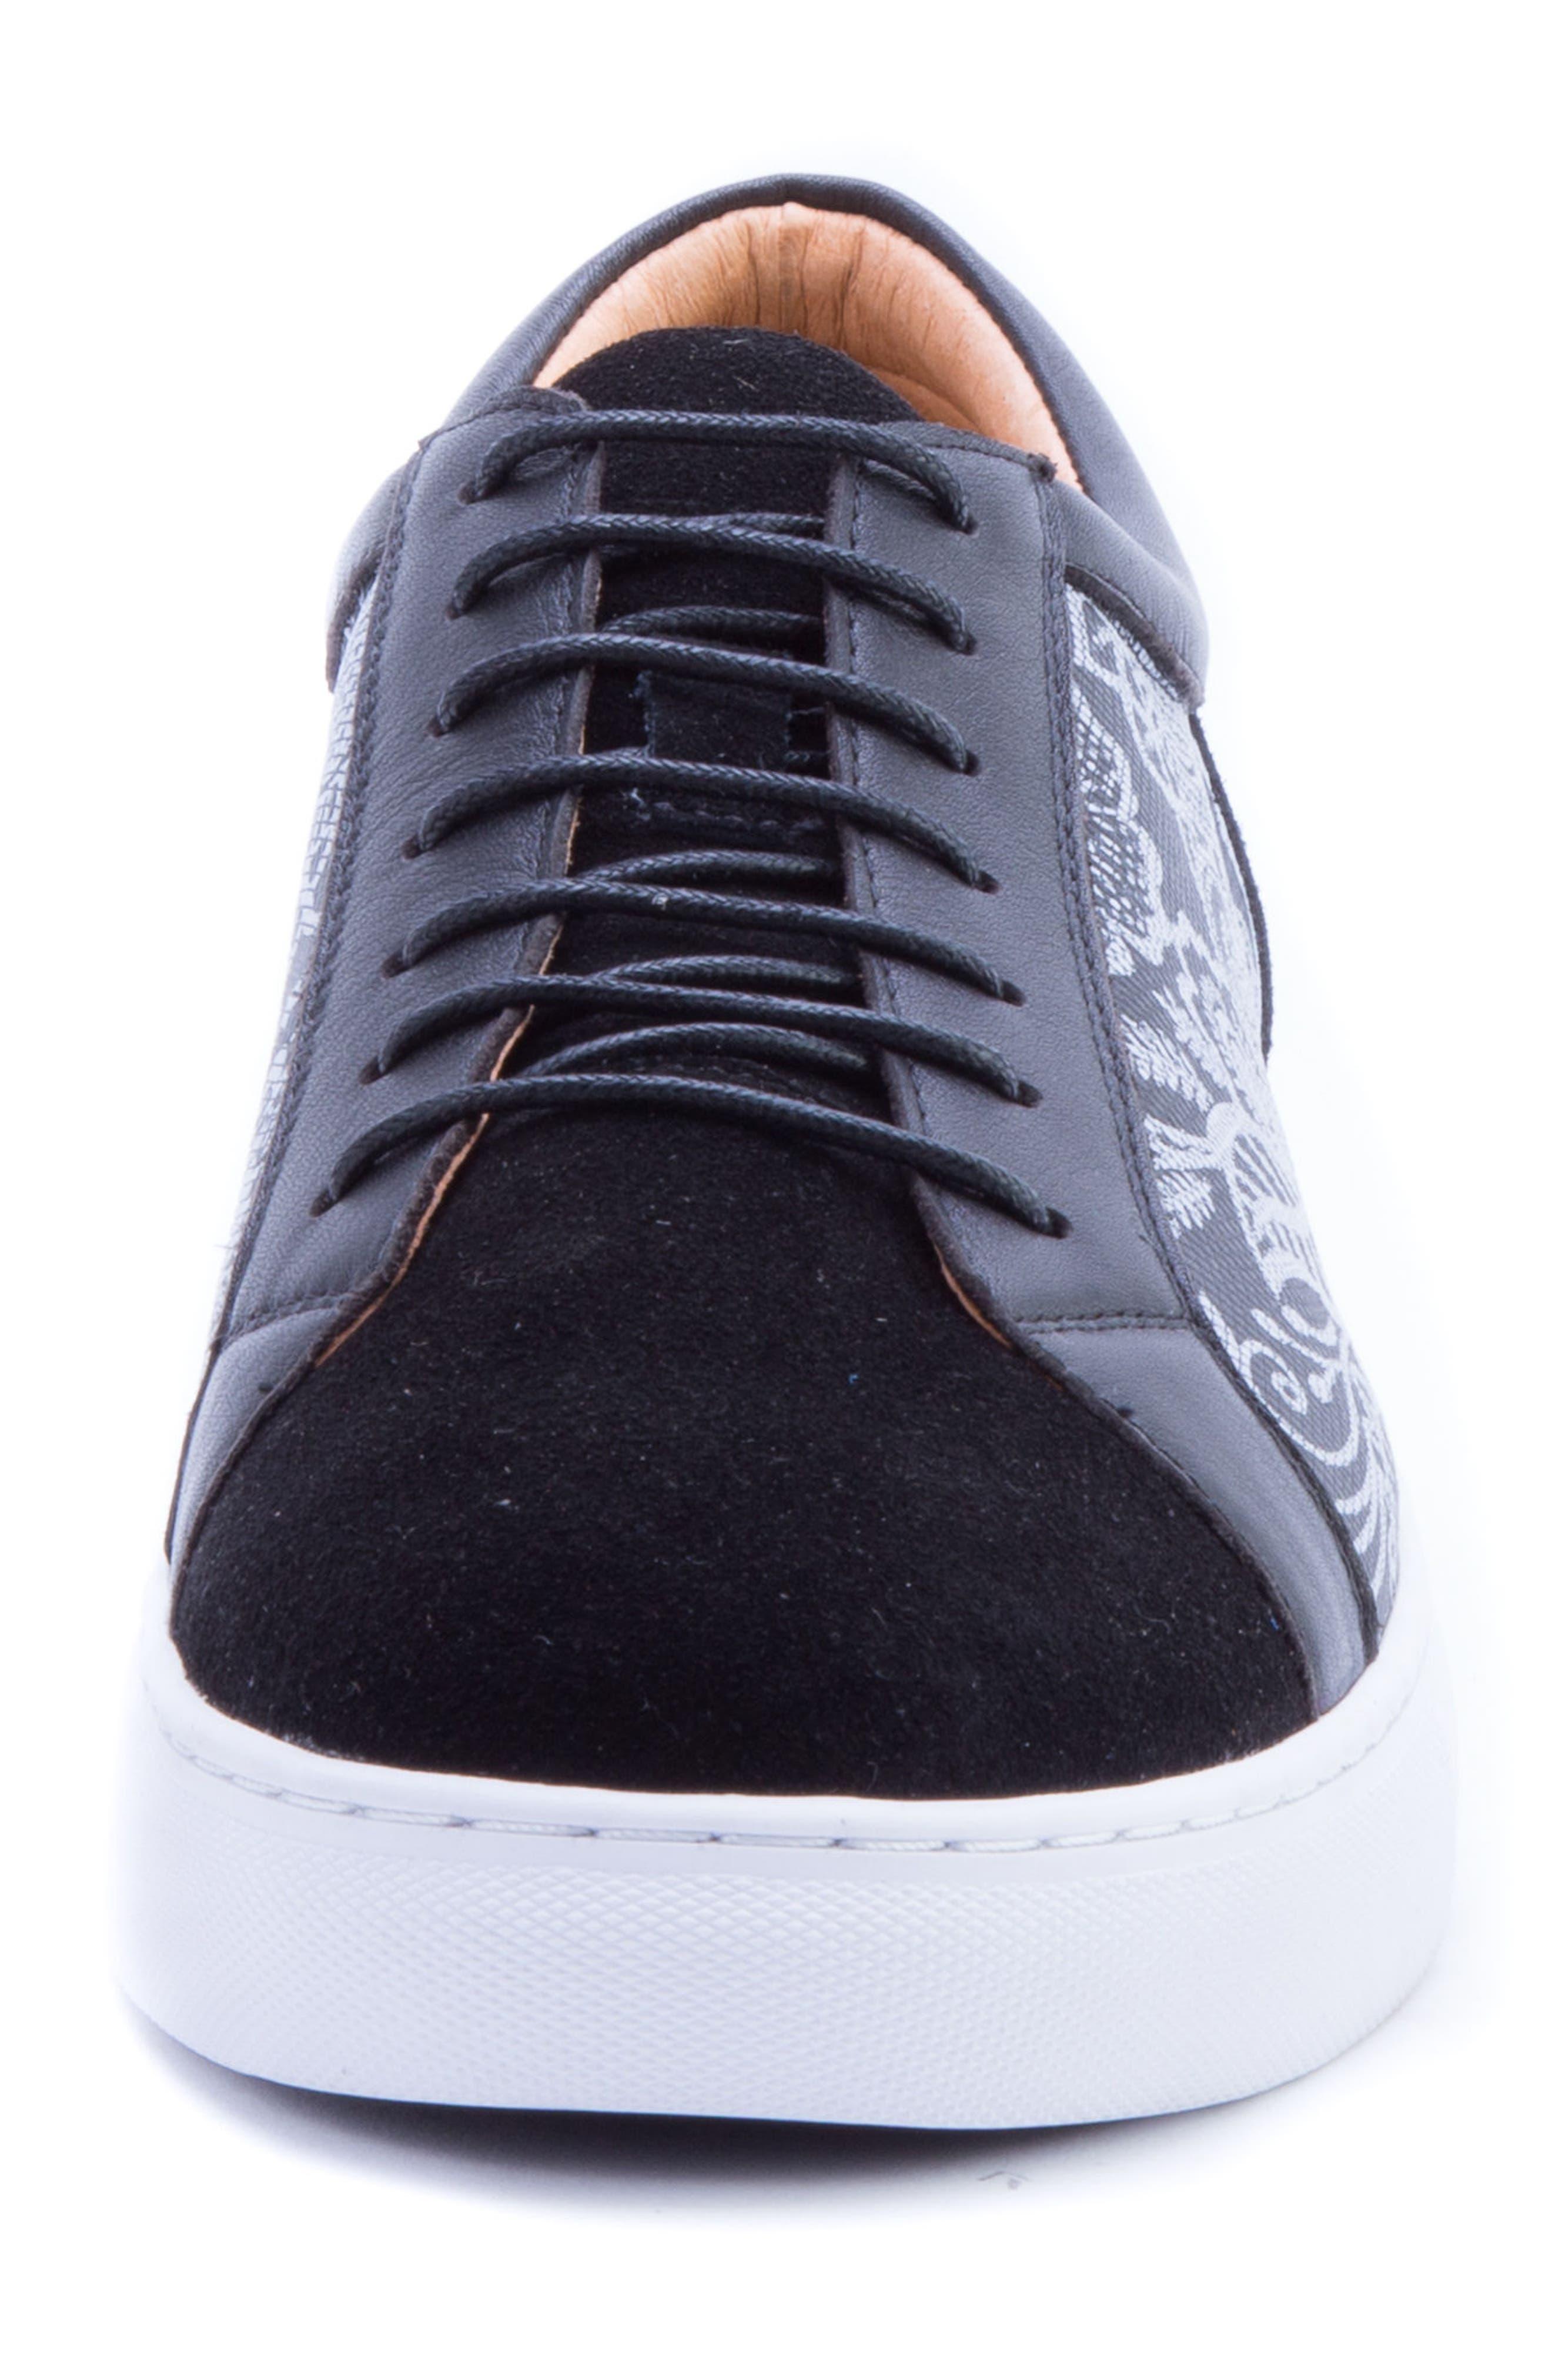 Rubio Floral Sneaker,                             Alternate thumbnail 4, color,                             BLACK SUEDE